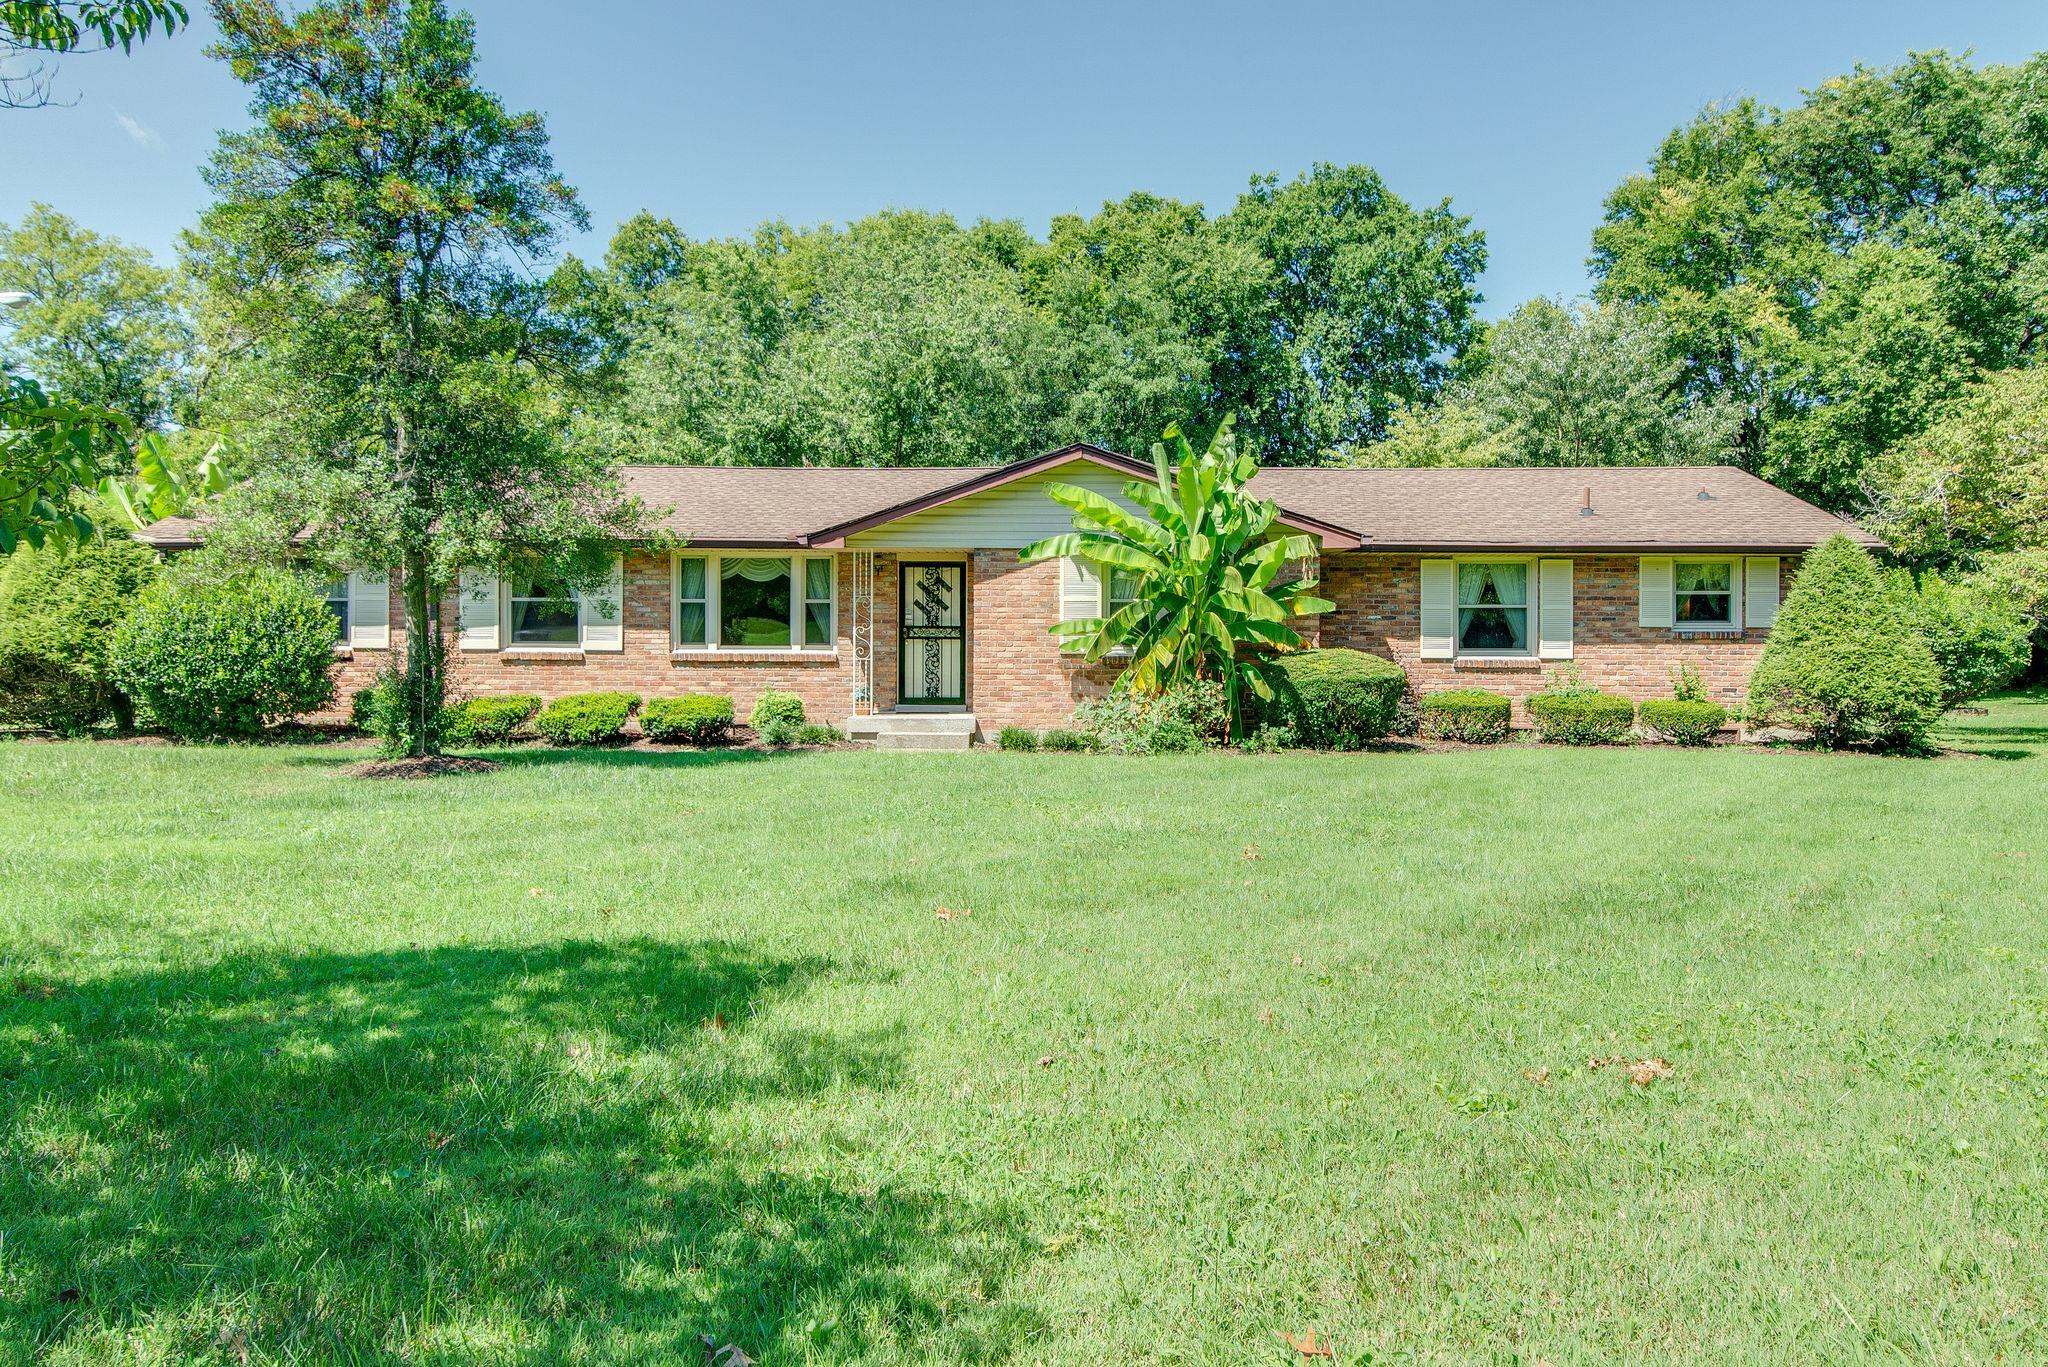 533 Lemont Drive, Nashville, TN 37216 - Nashville, TN real estate listing